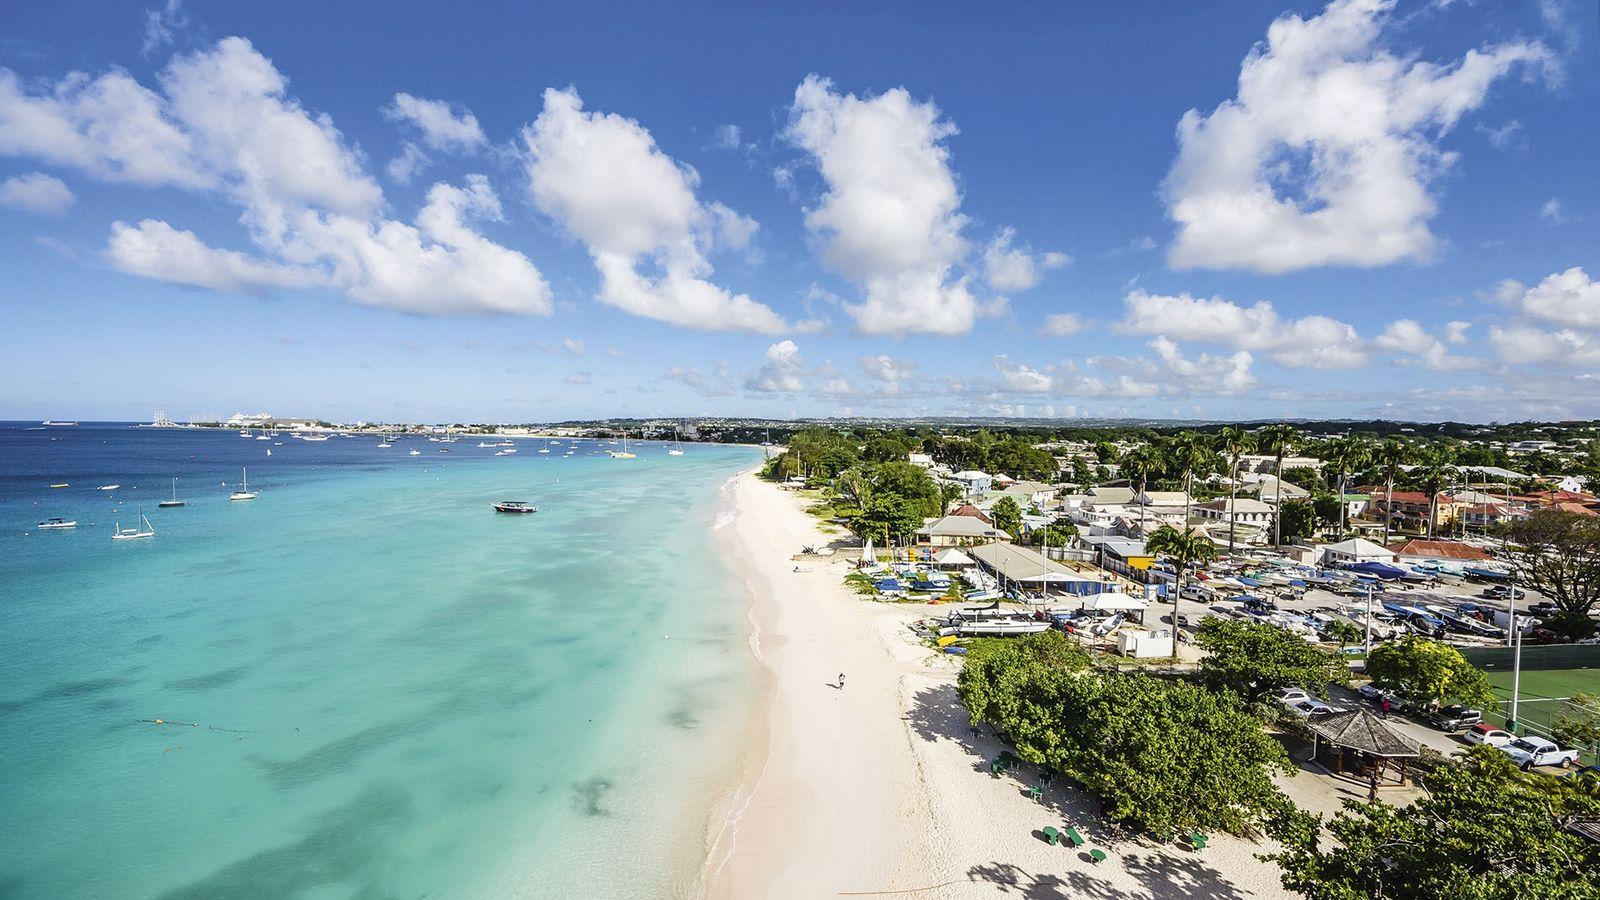 Pristine beach in Barbados